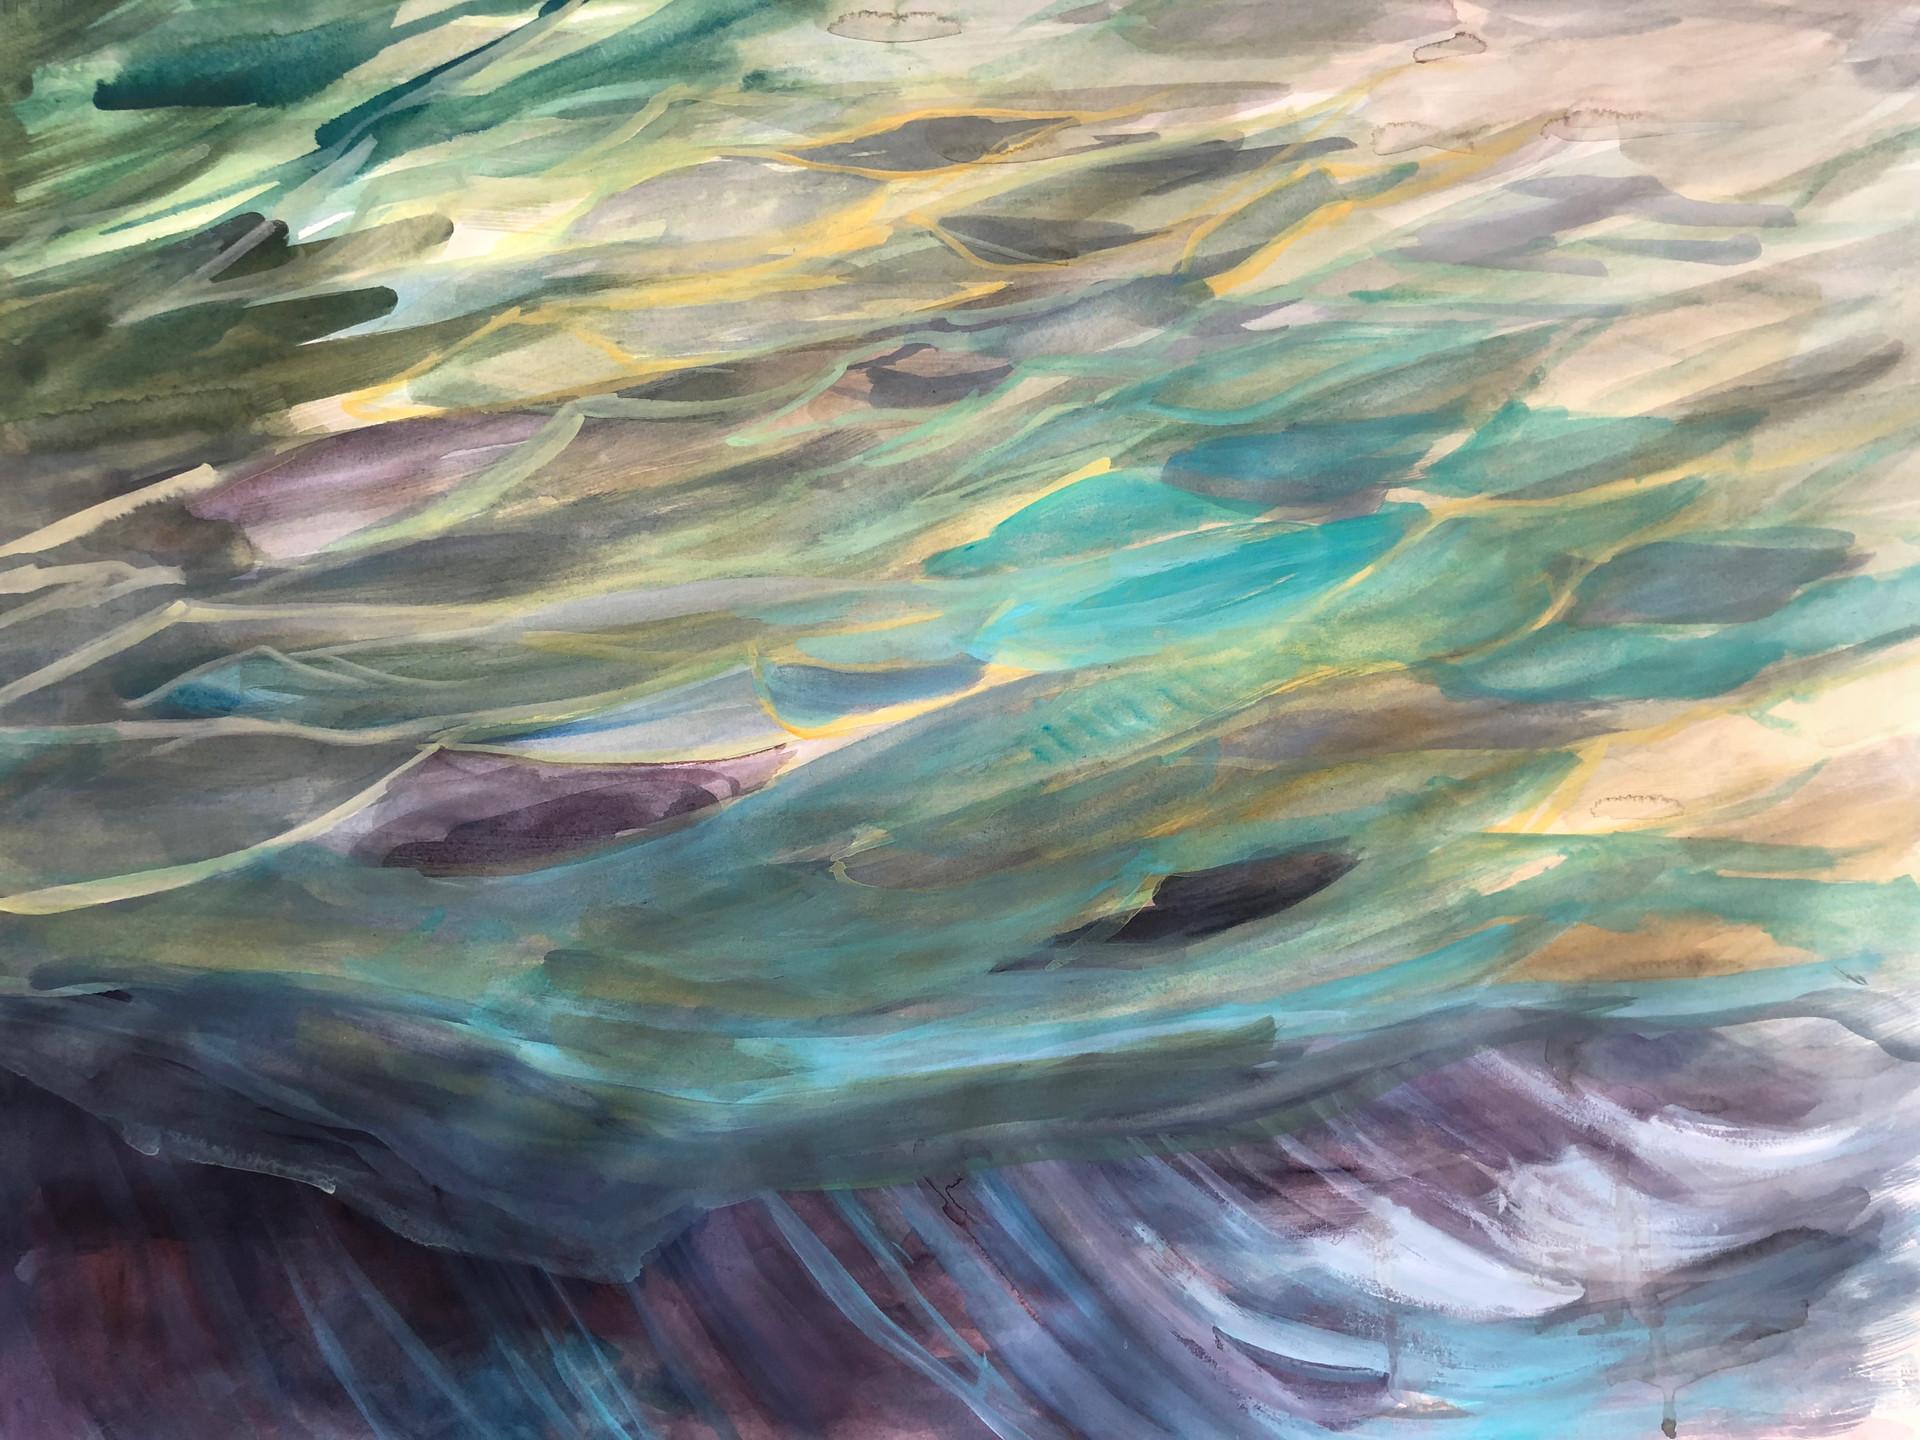 Storm Surge by Megan Vossler